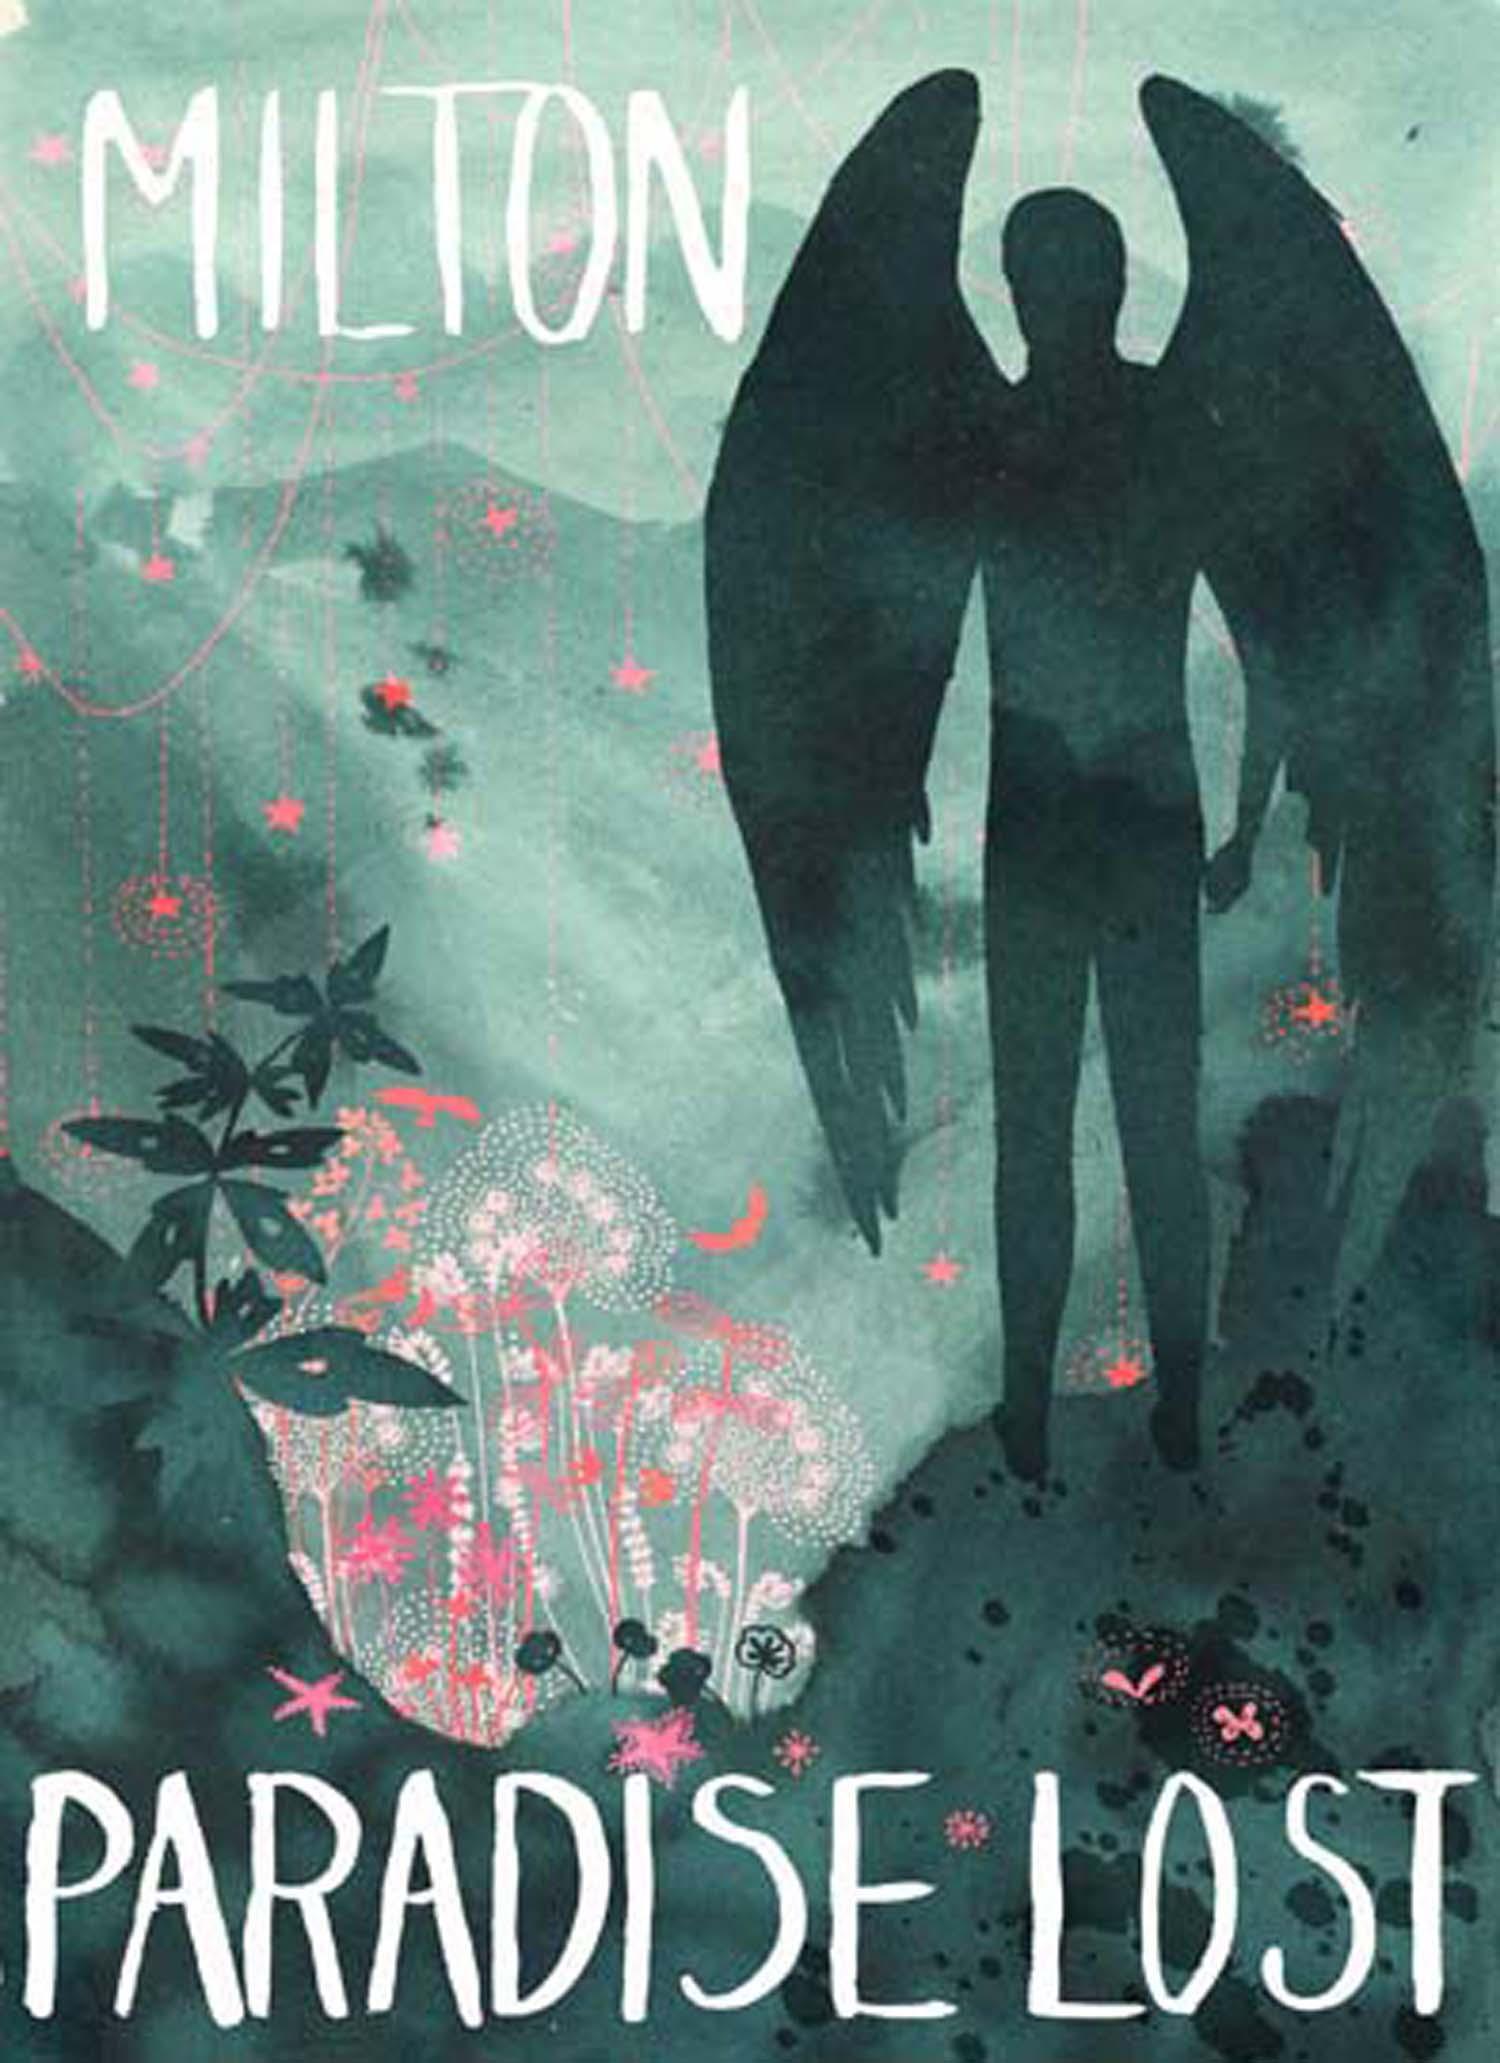 Paradise lost Milton - cover illustration